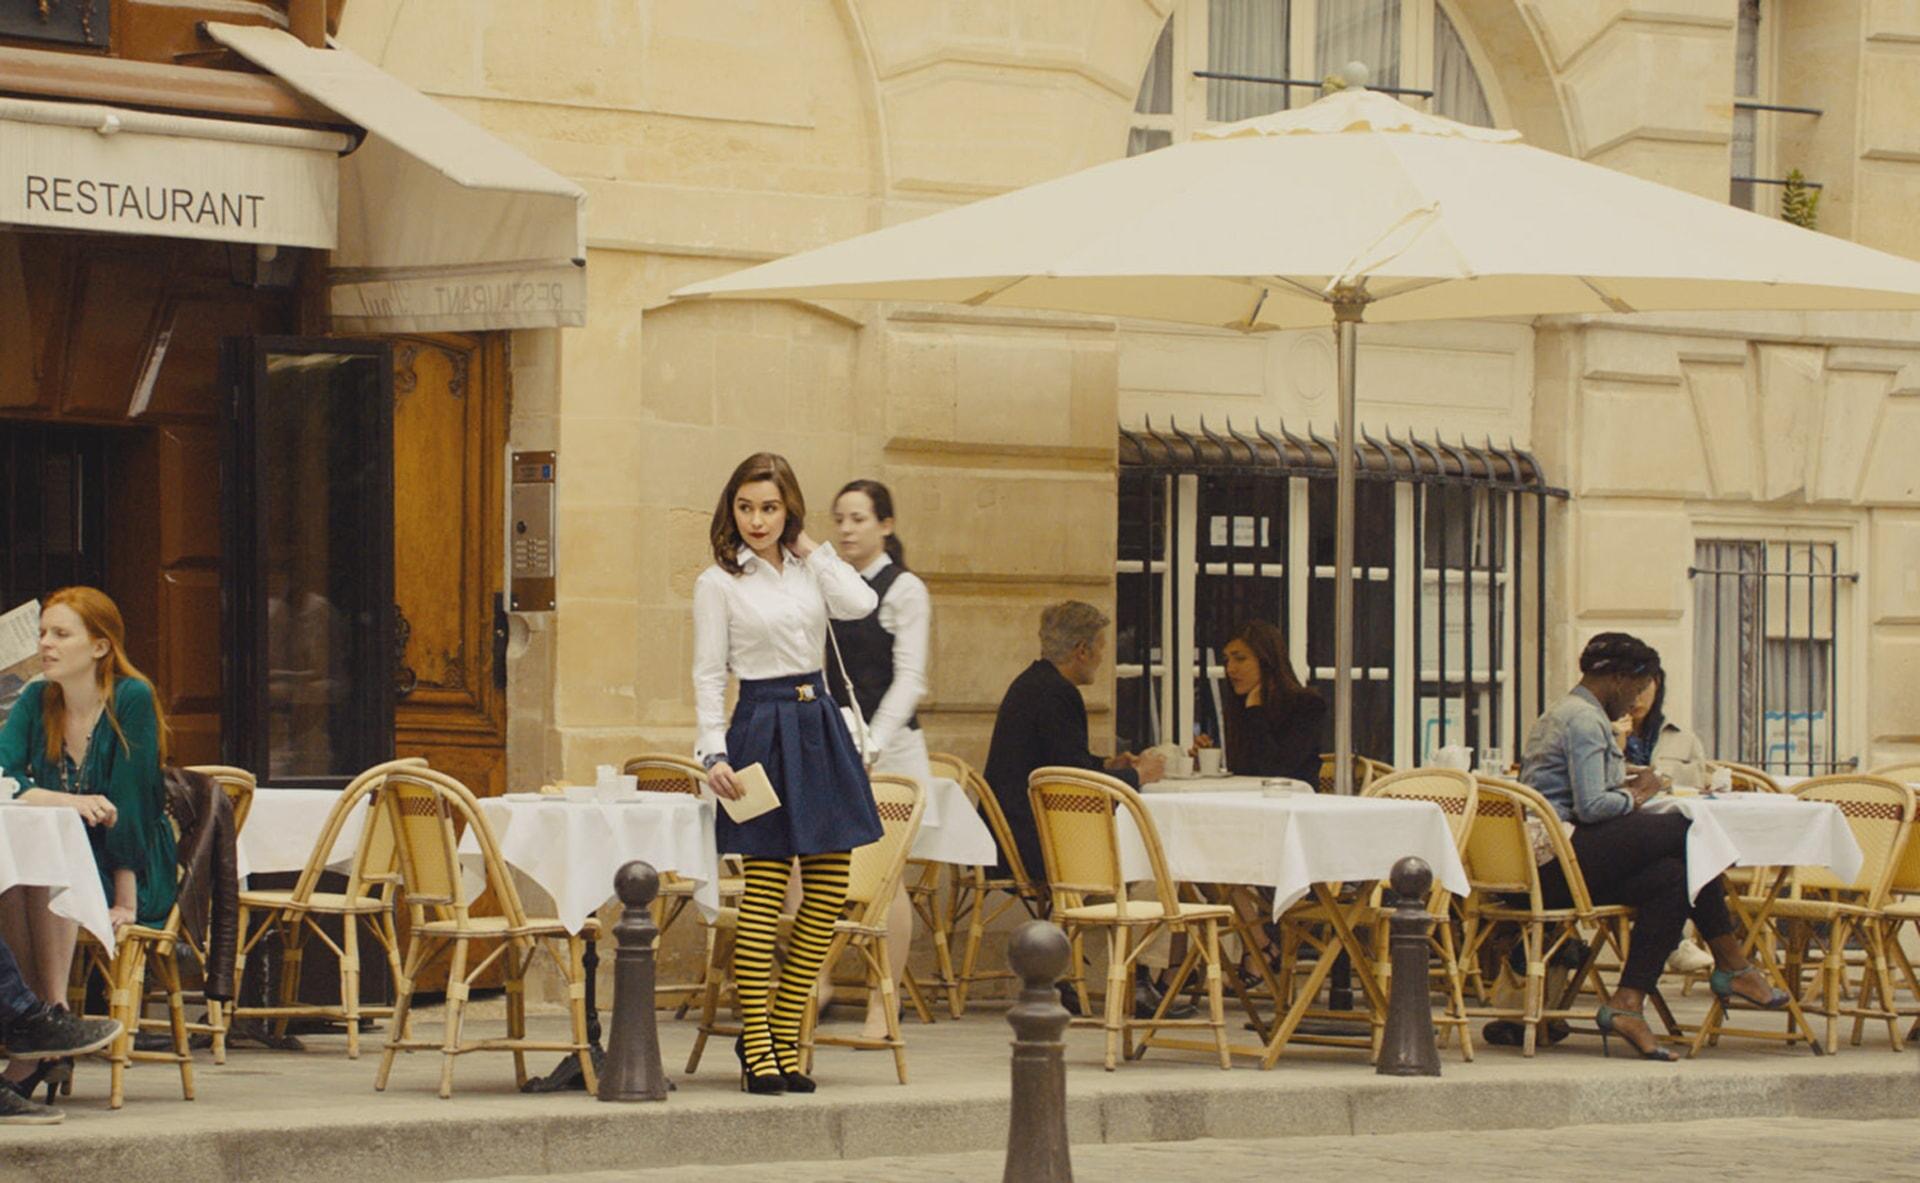 EMILIA CLARKE as Lou Clark standing outside an outdoor cafe.